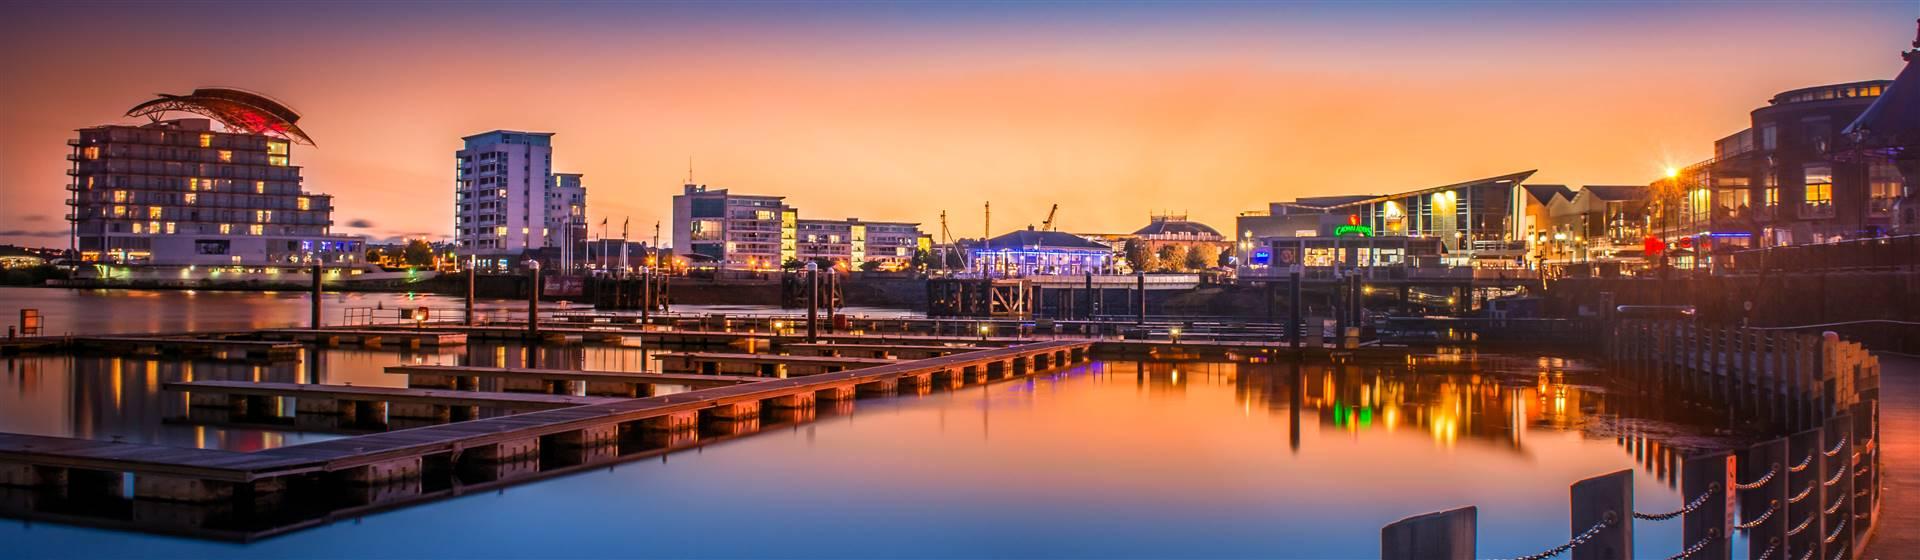 Cardiff City Break (Hilton Hotel)